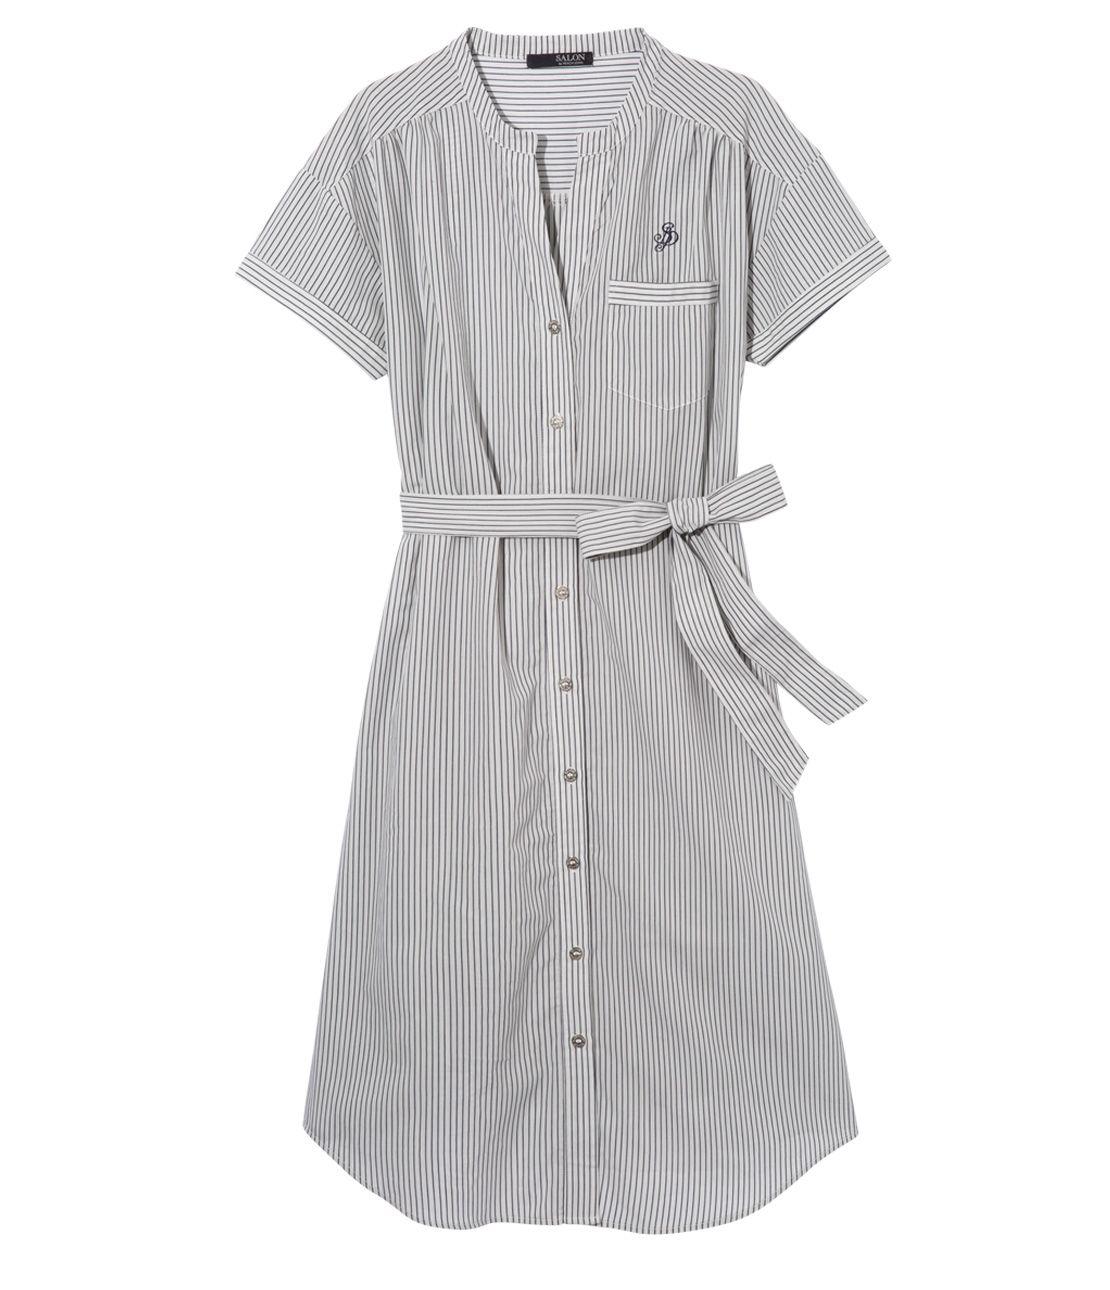 Ice Cotton (R) short-sleeved shirt dress